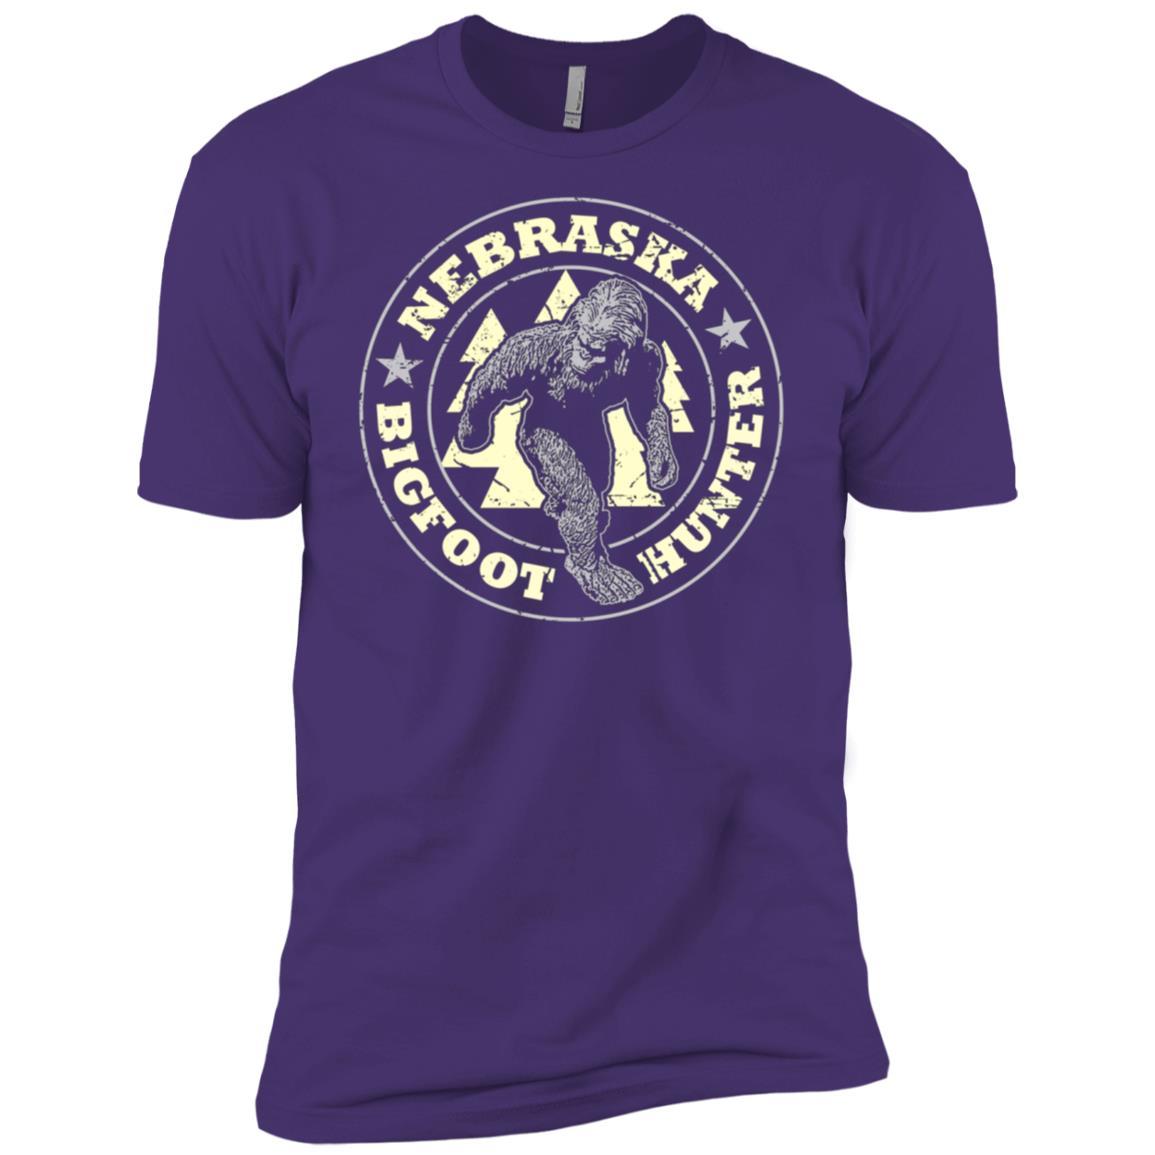 Nebraska Bigfoot Hunter Believe Men Short Sleeve T-Shirt